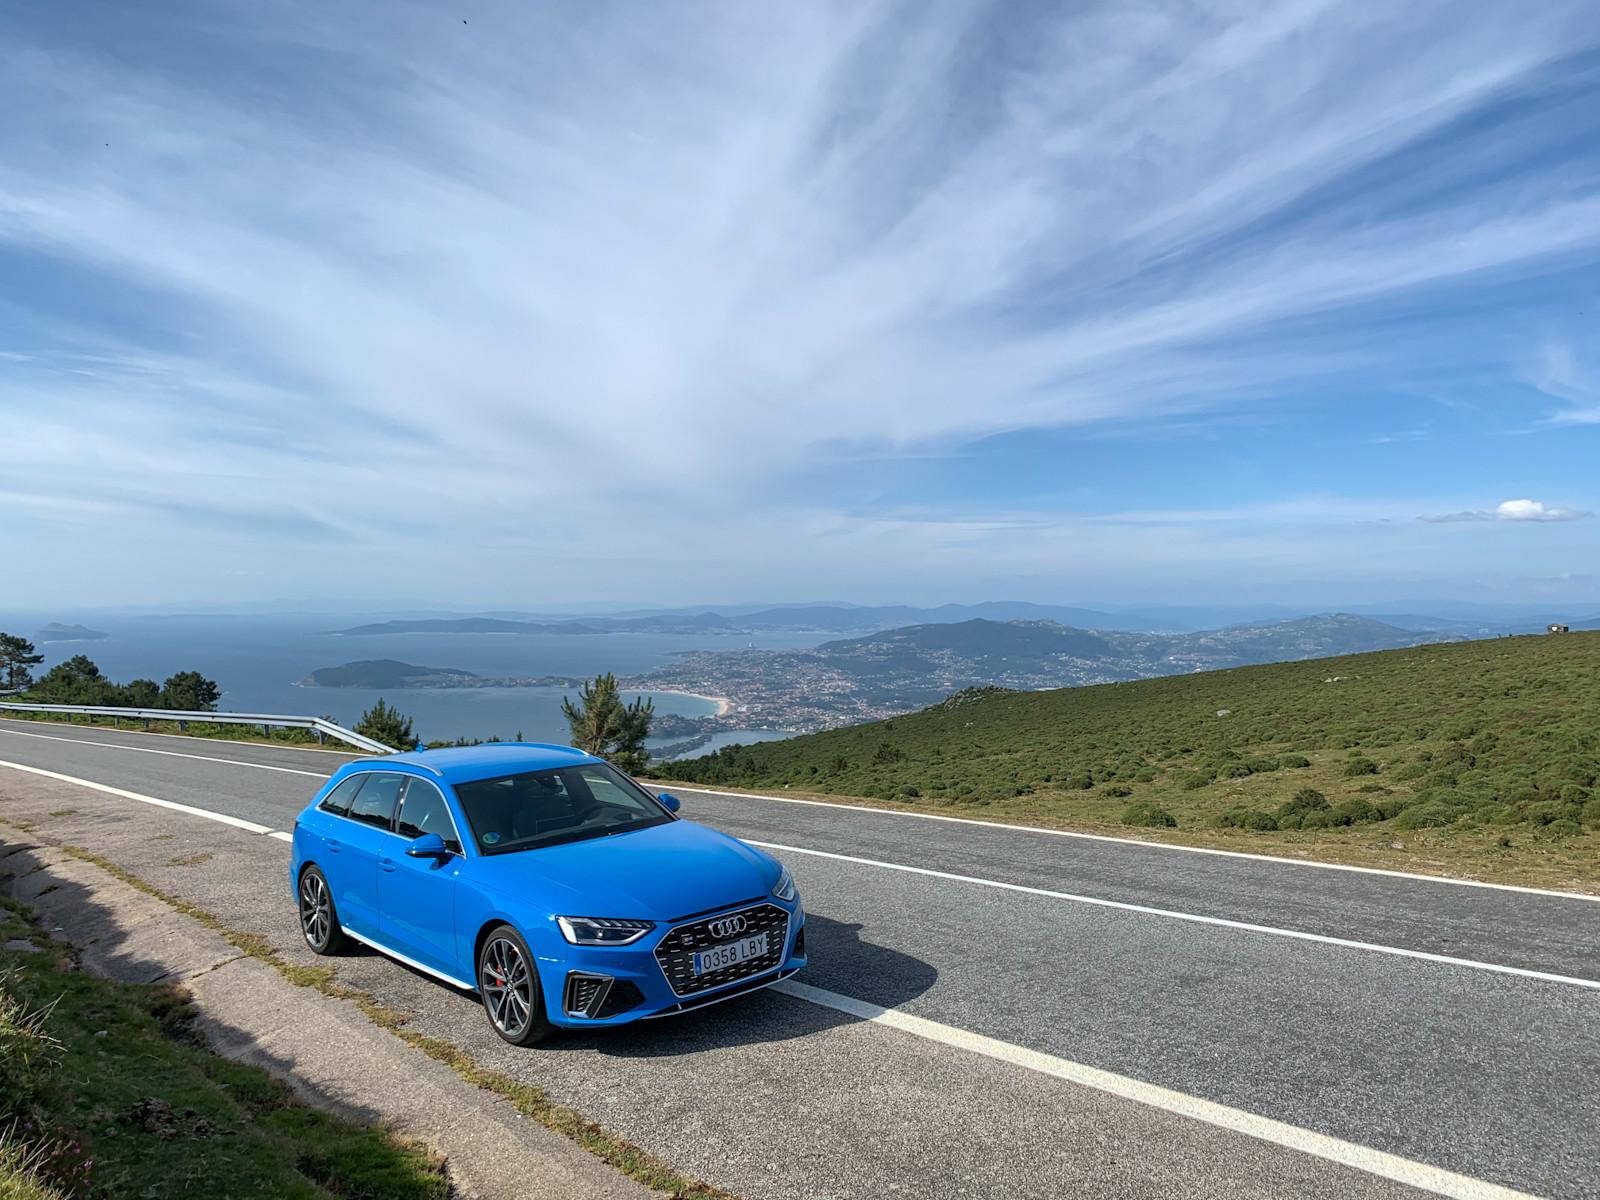 Foto de Audi S4 Avant 2020 (prueba) (1/26)